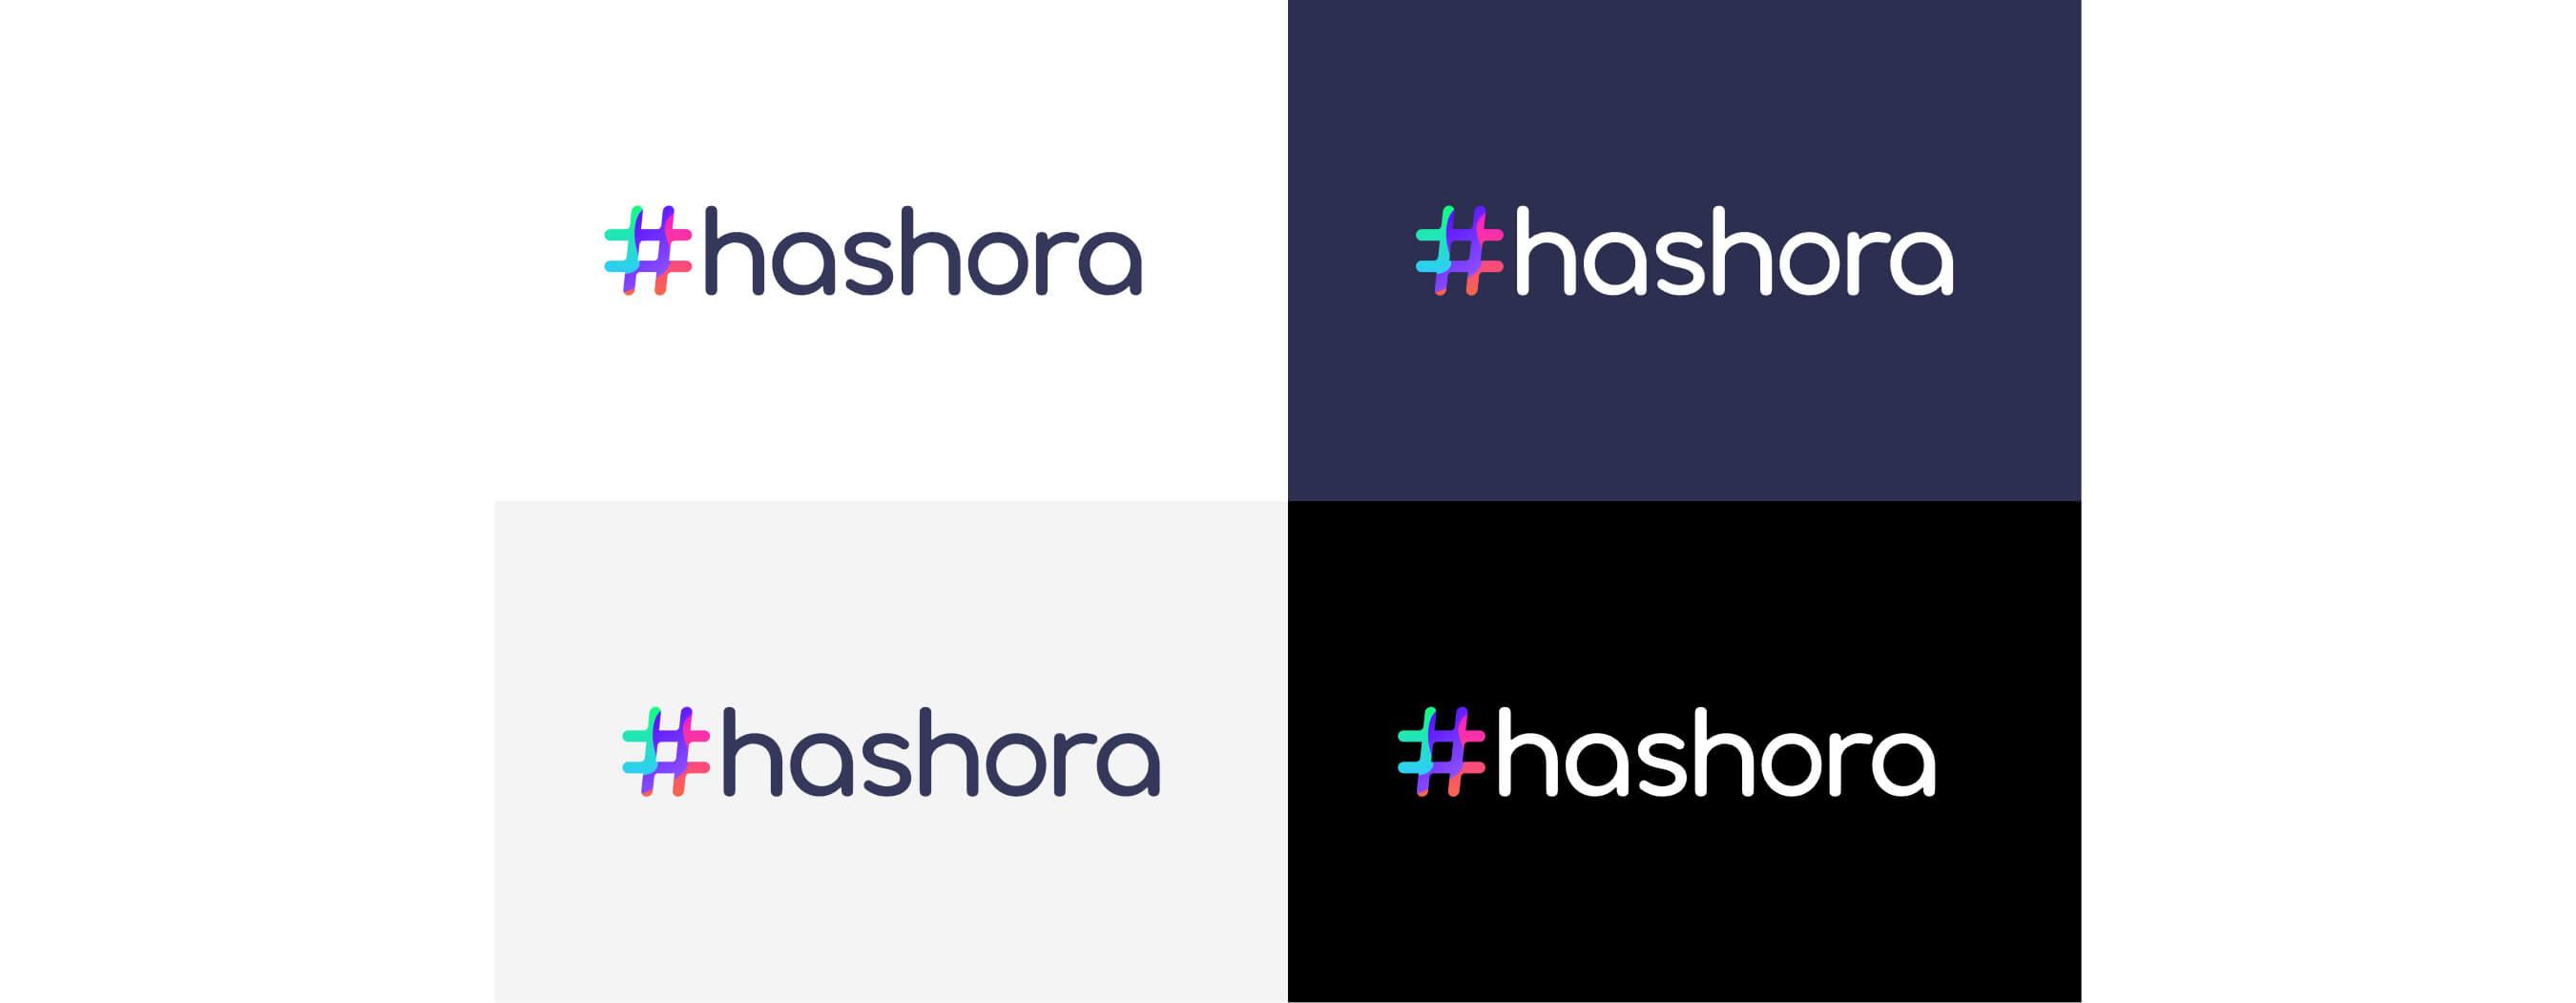 Hashora Logo Design by wow.design